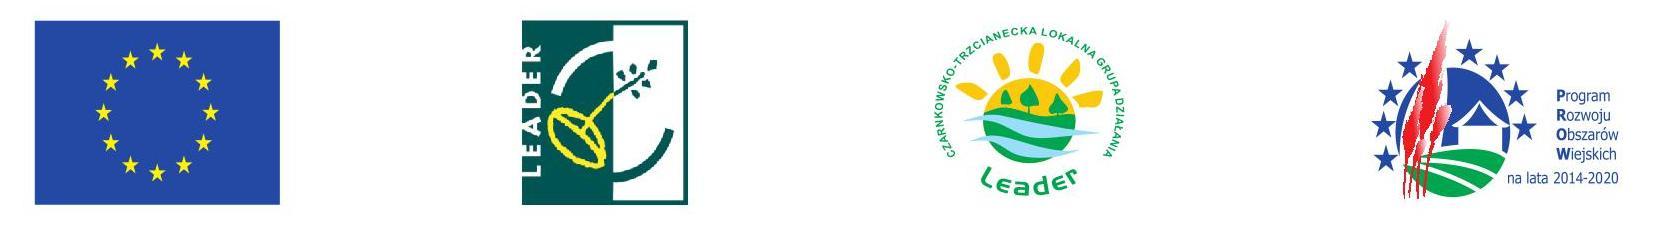 - logo_dla_aktywnych.jpg